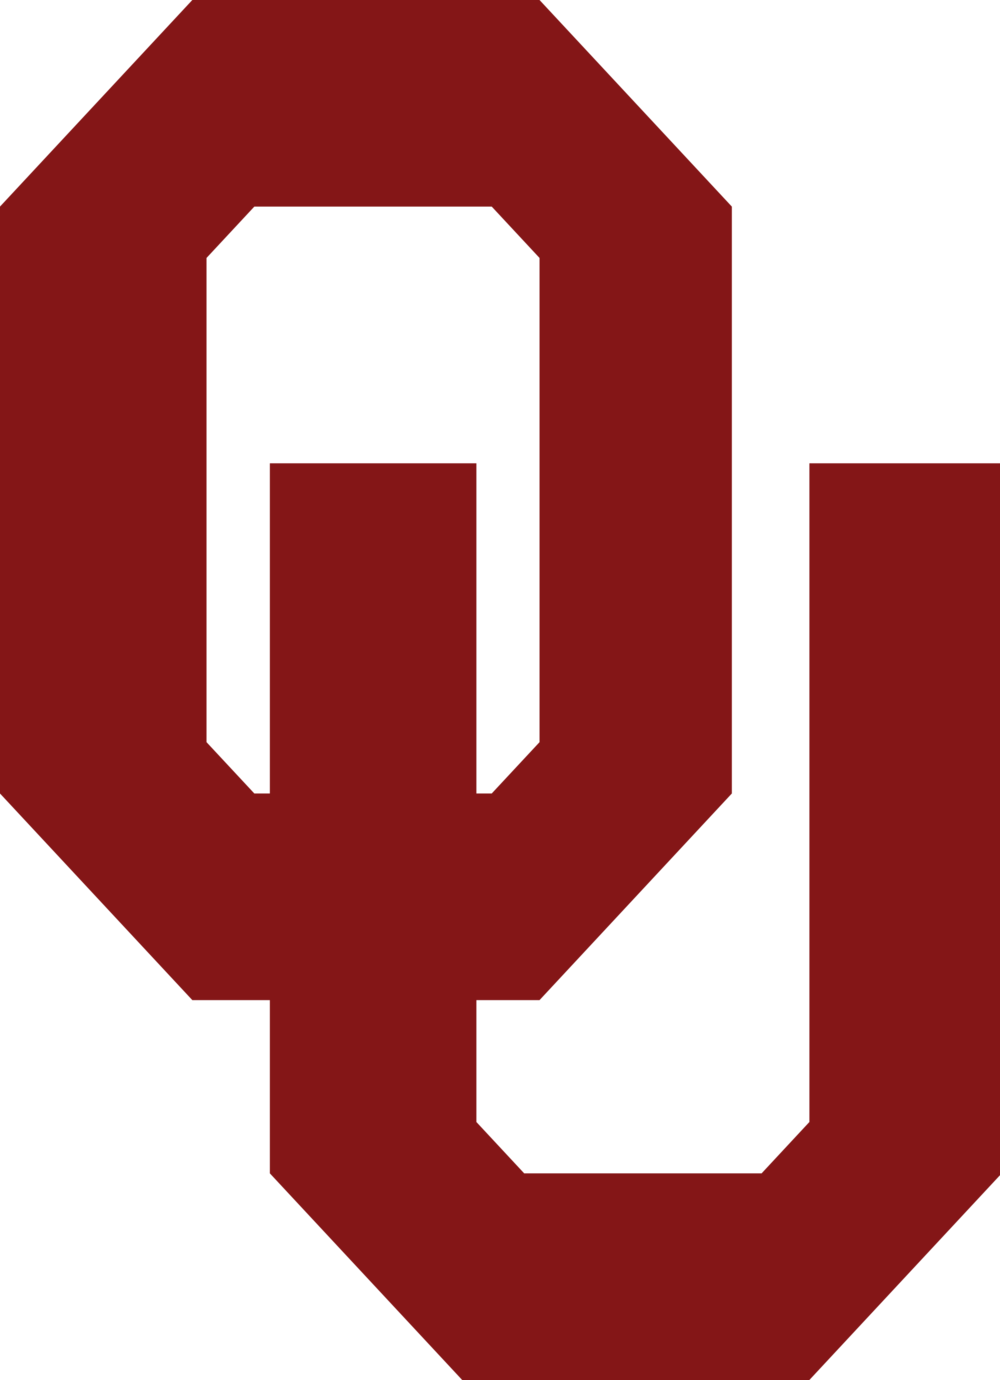 Oklahoma_Sooners_logo.png